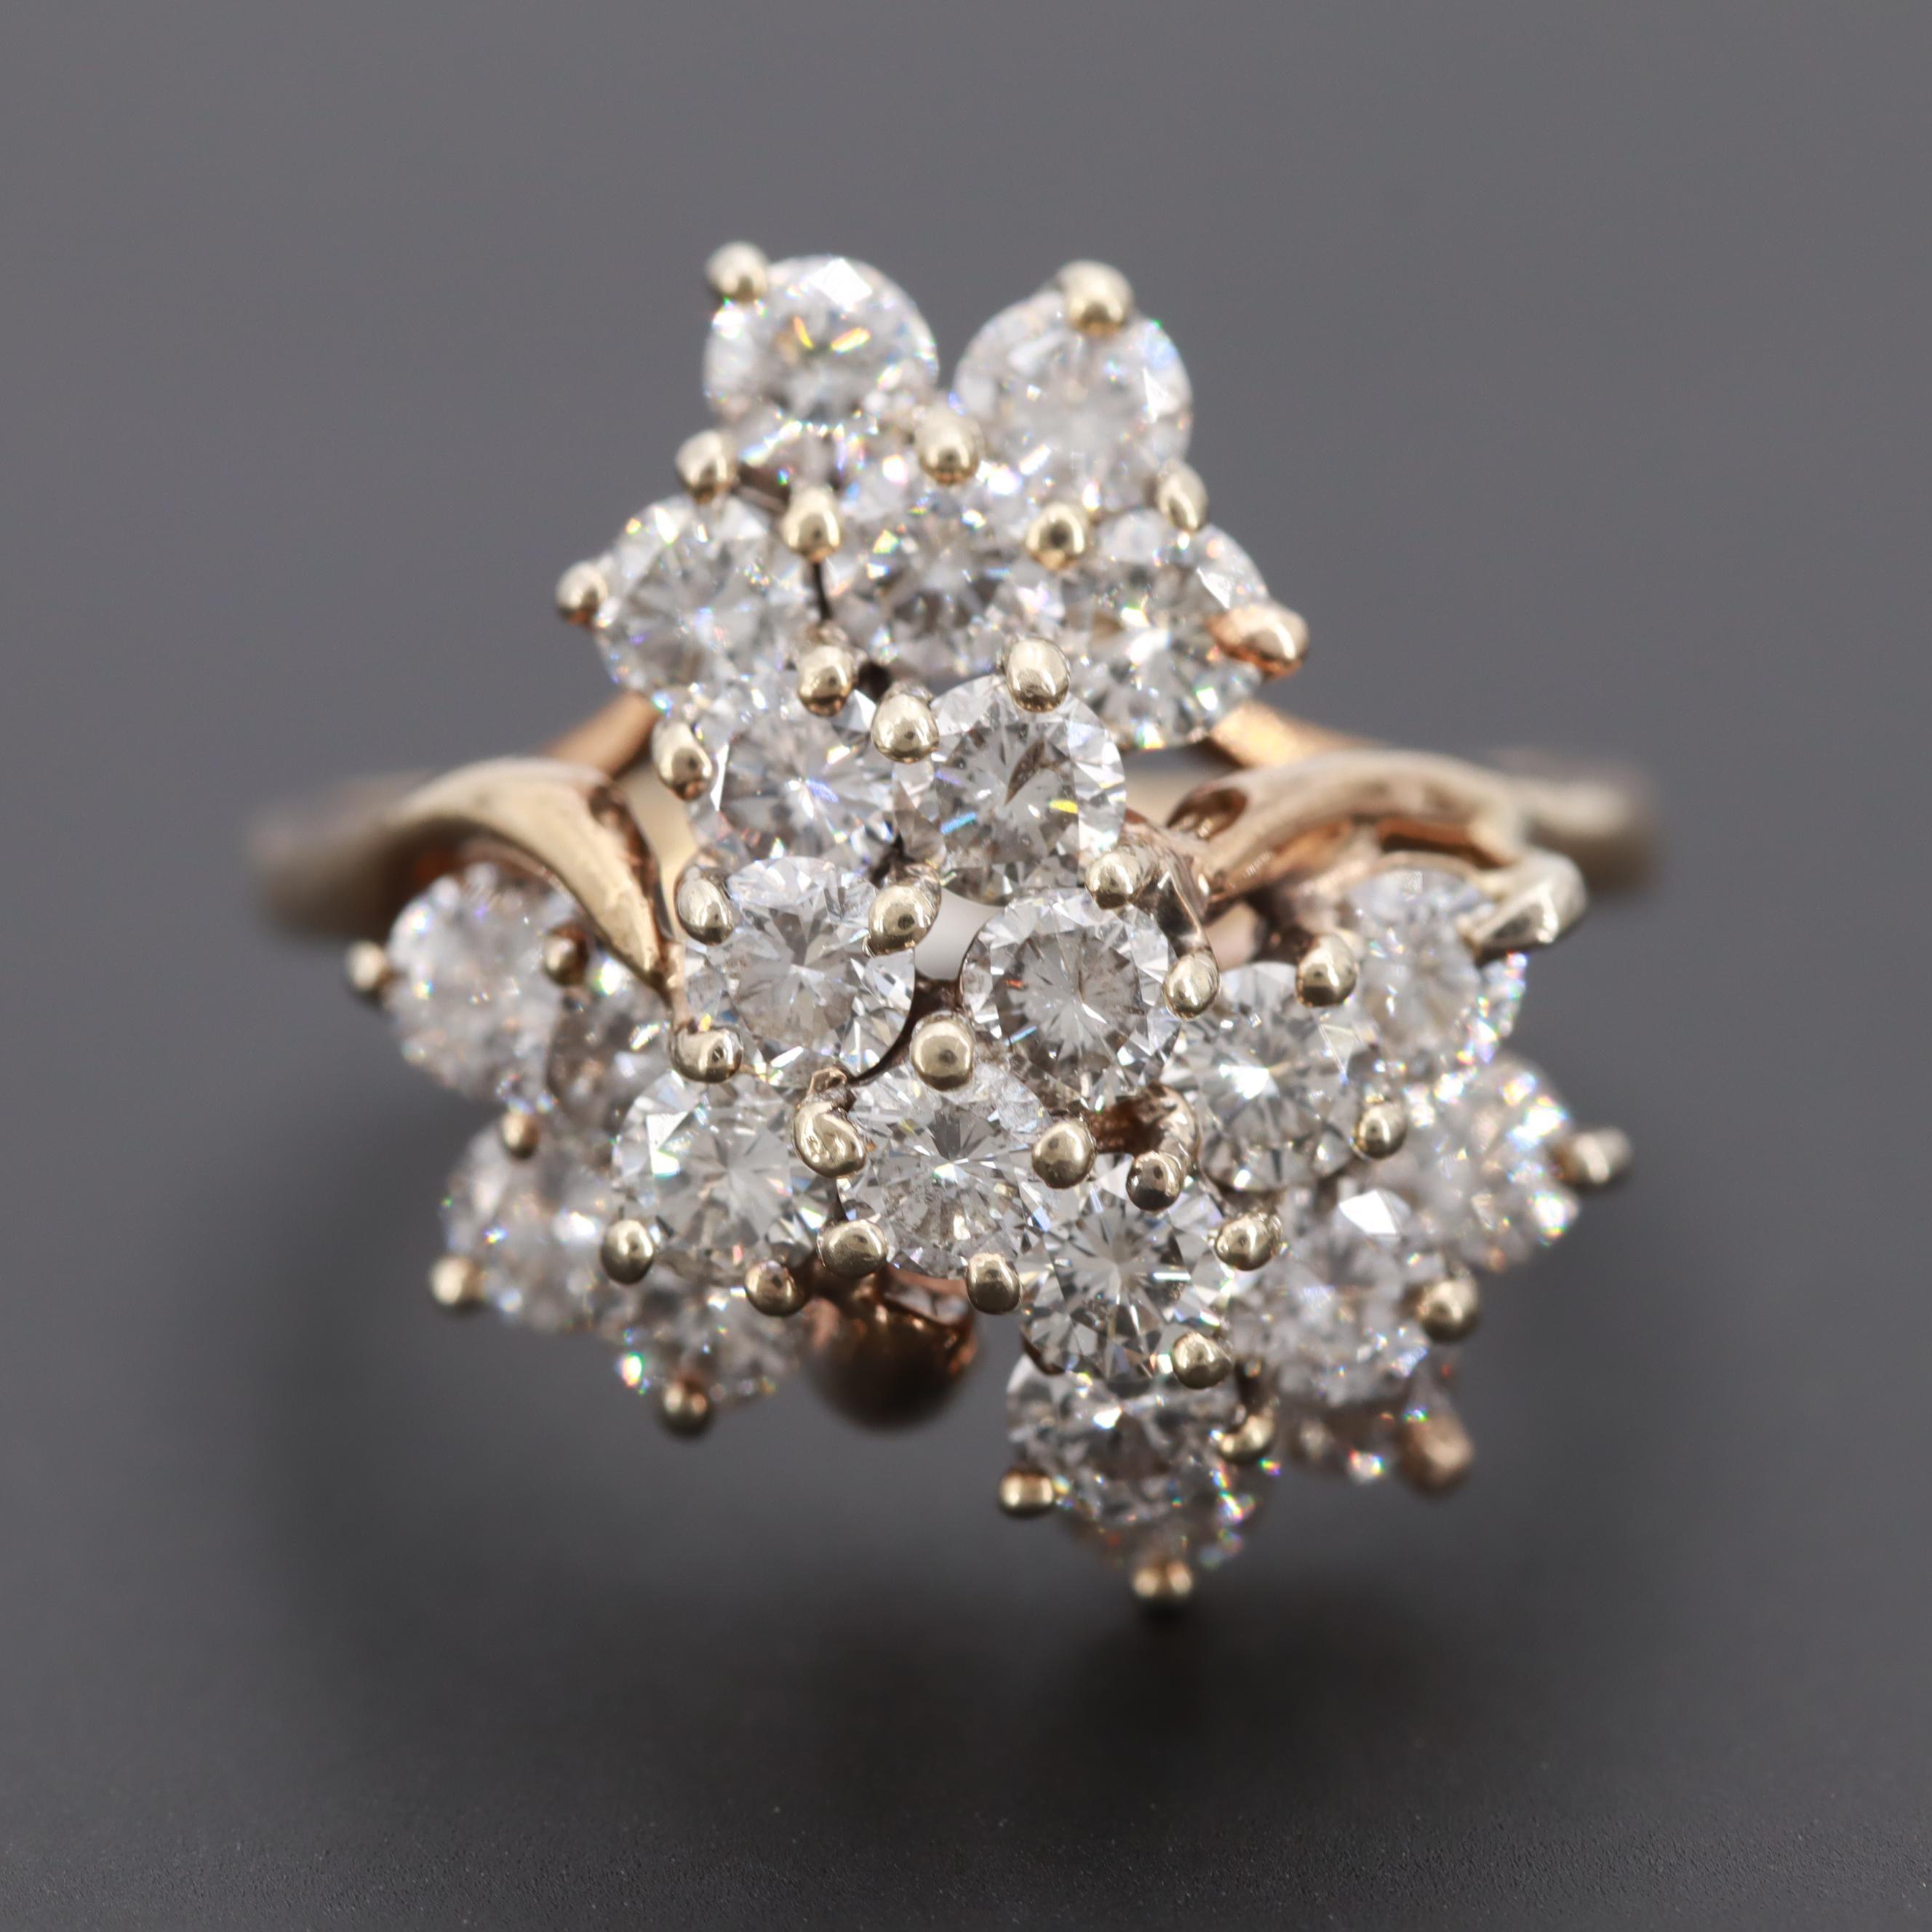 14K Yellow Gold 2.41 CTW Diamond Ring